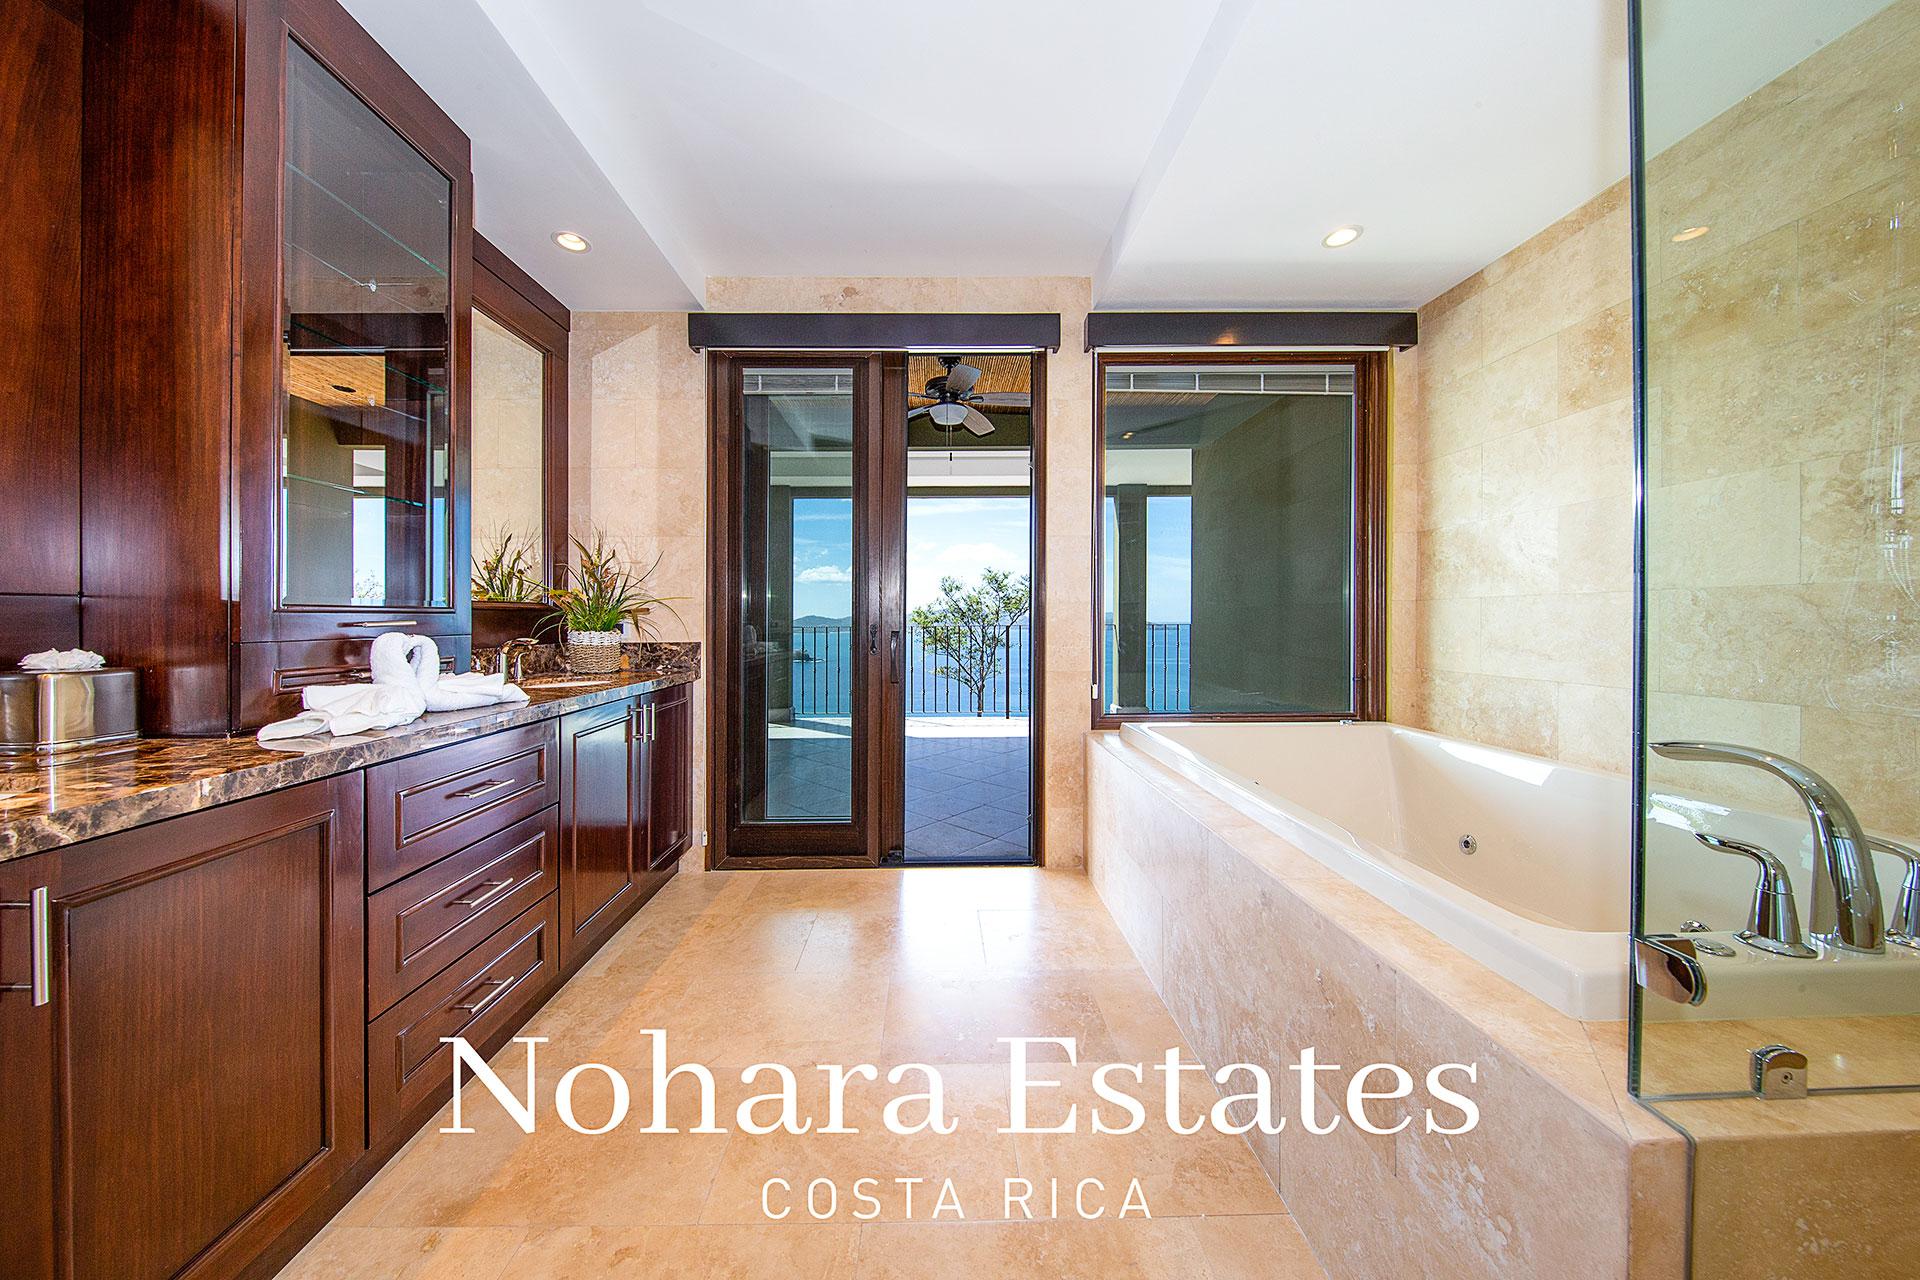 Nohara Estates Costa Rica 360 Esplendor Del Pacifico 10